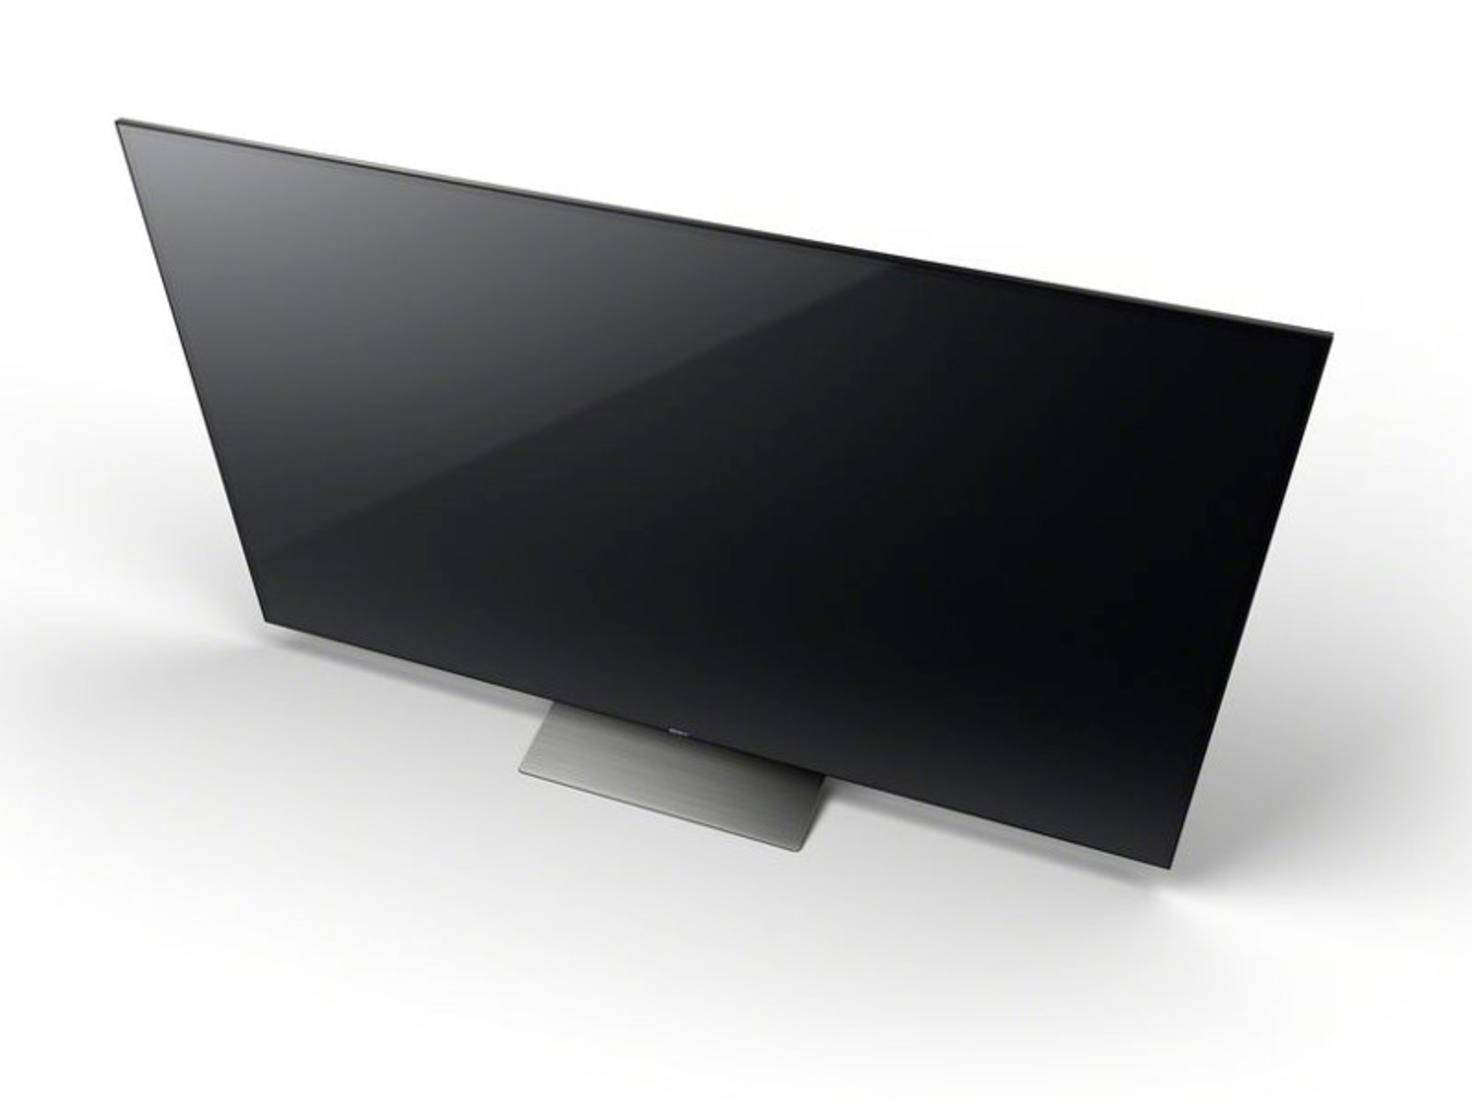 Sony_XBR_X940D